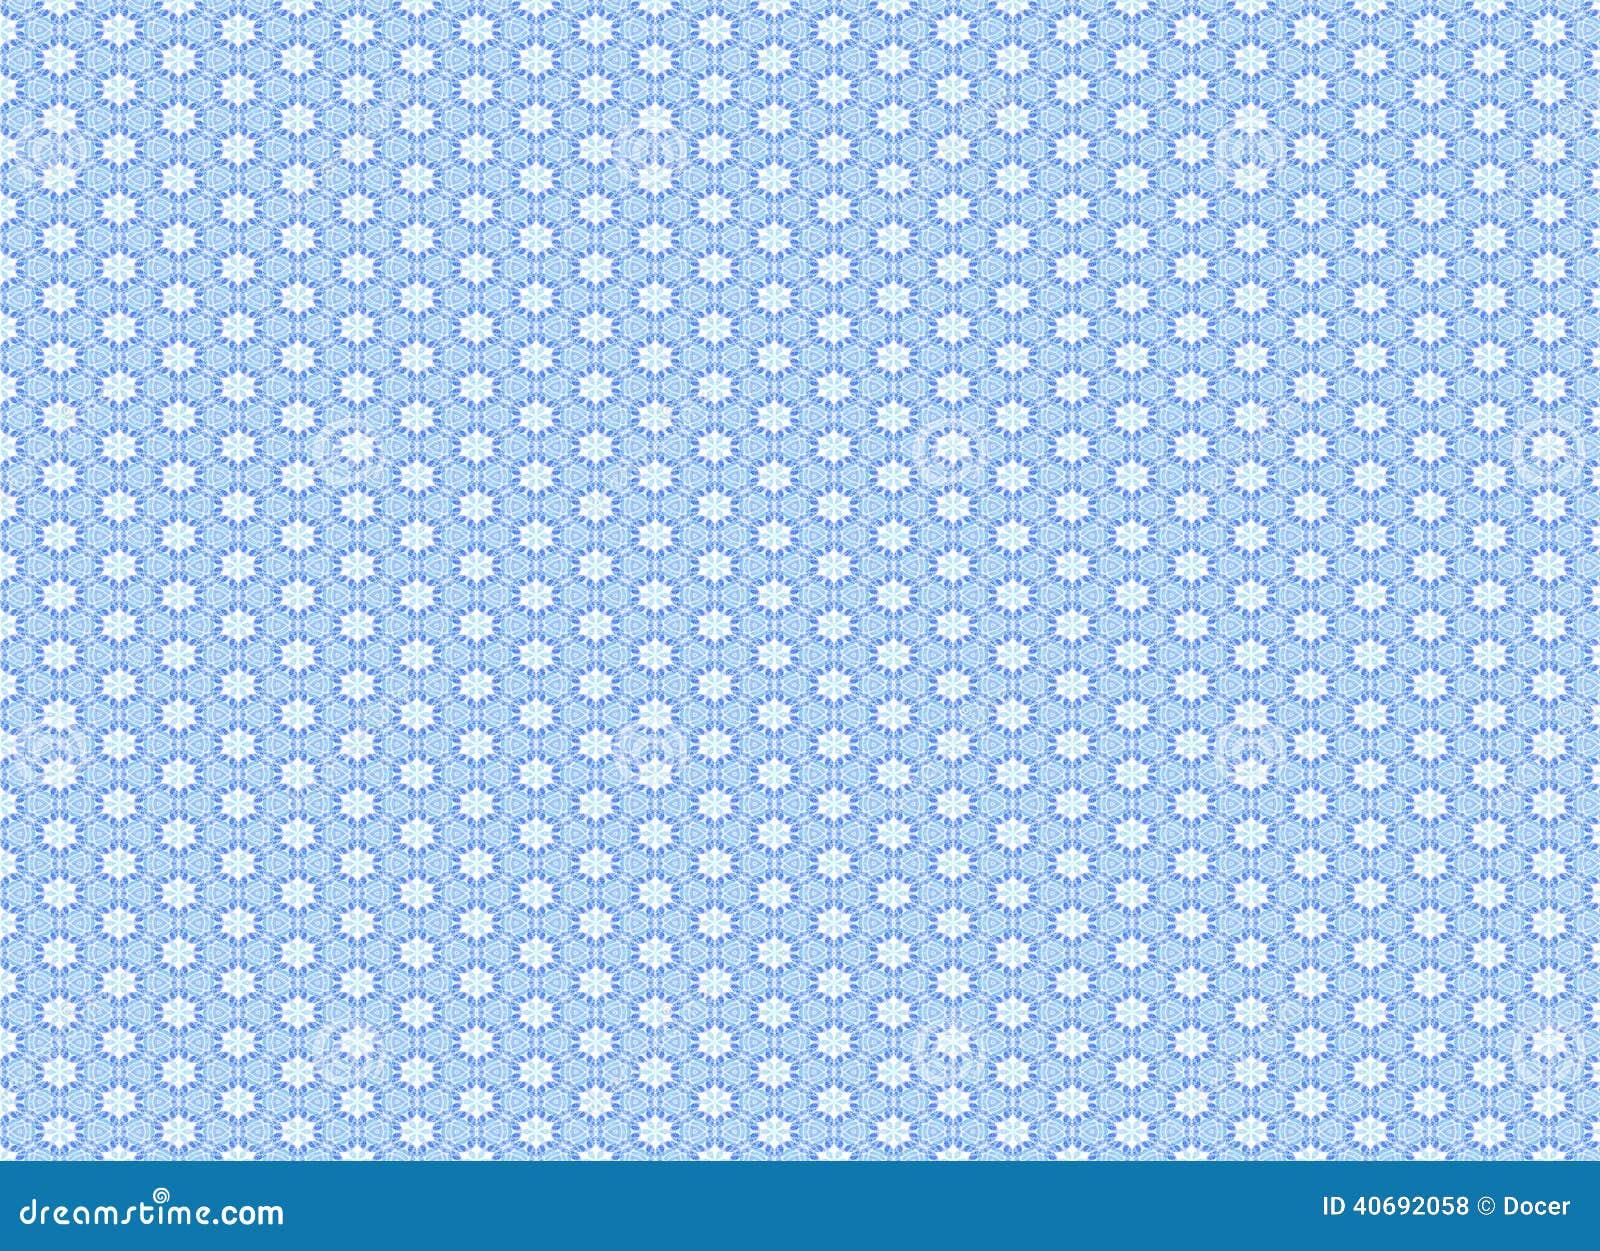 Small Blue Flowers Wallpaper Pattern Stock Illustration